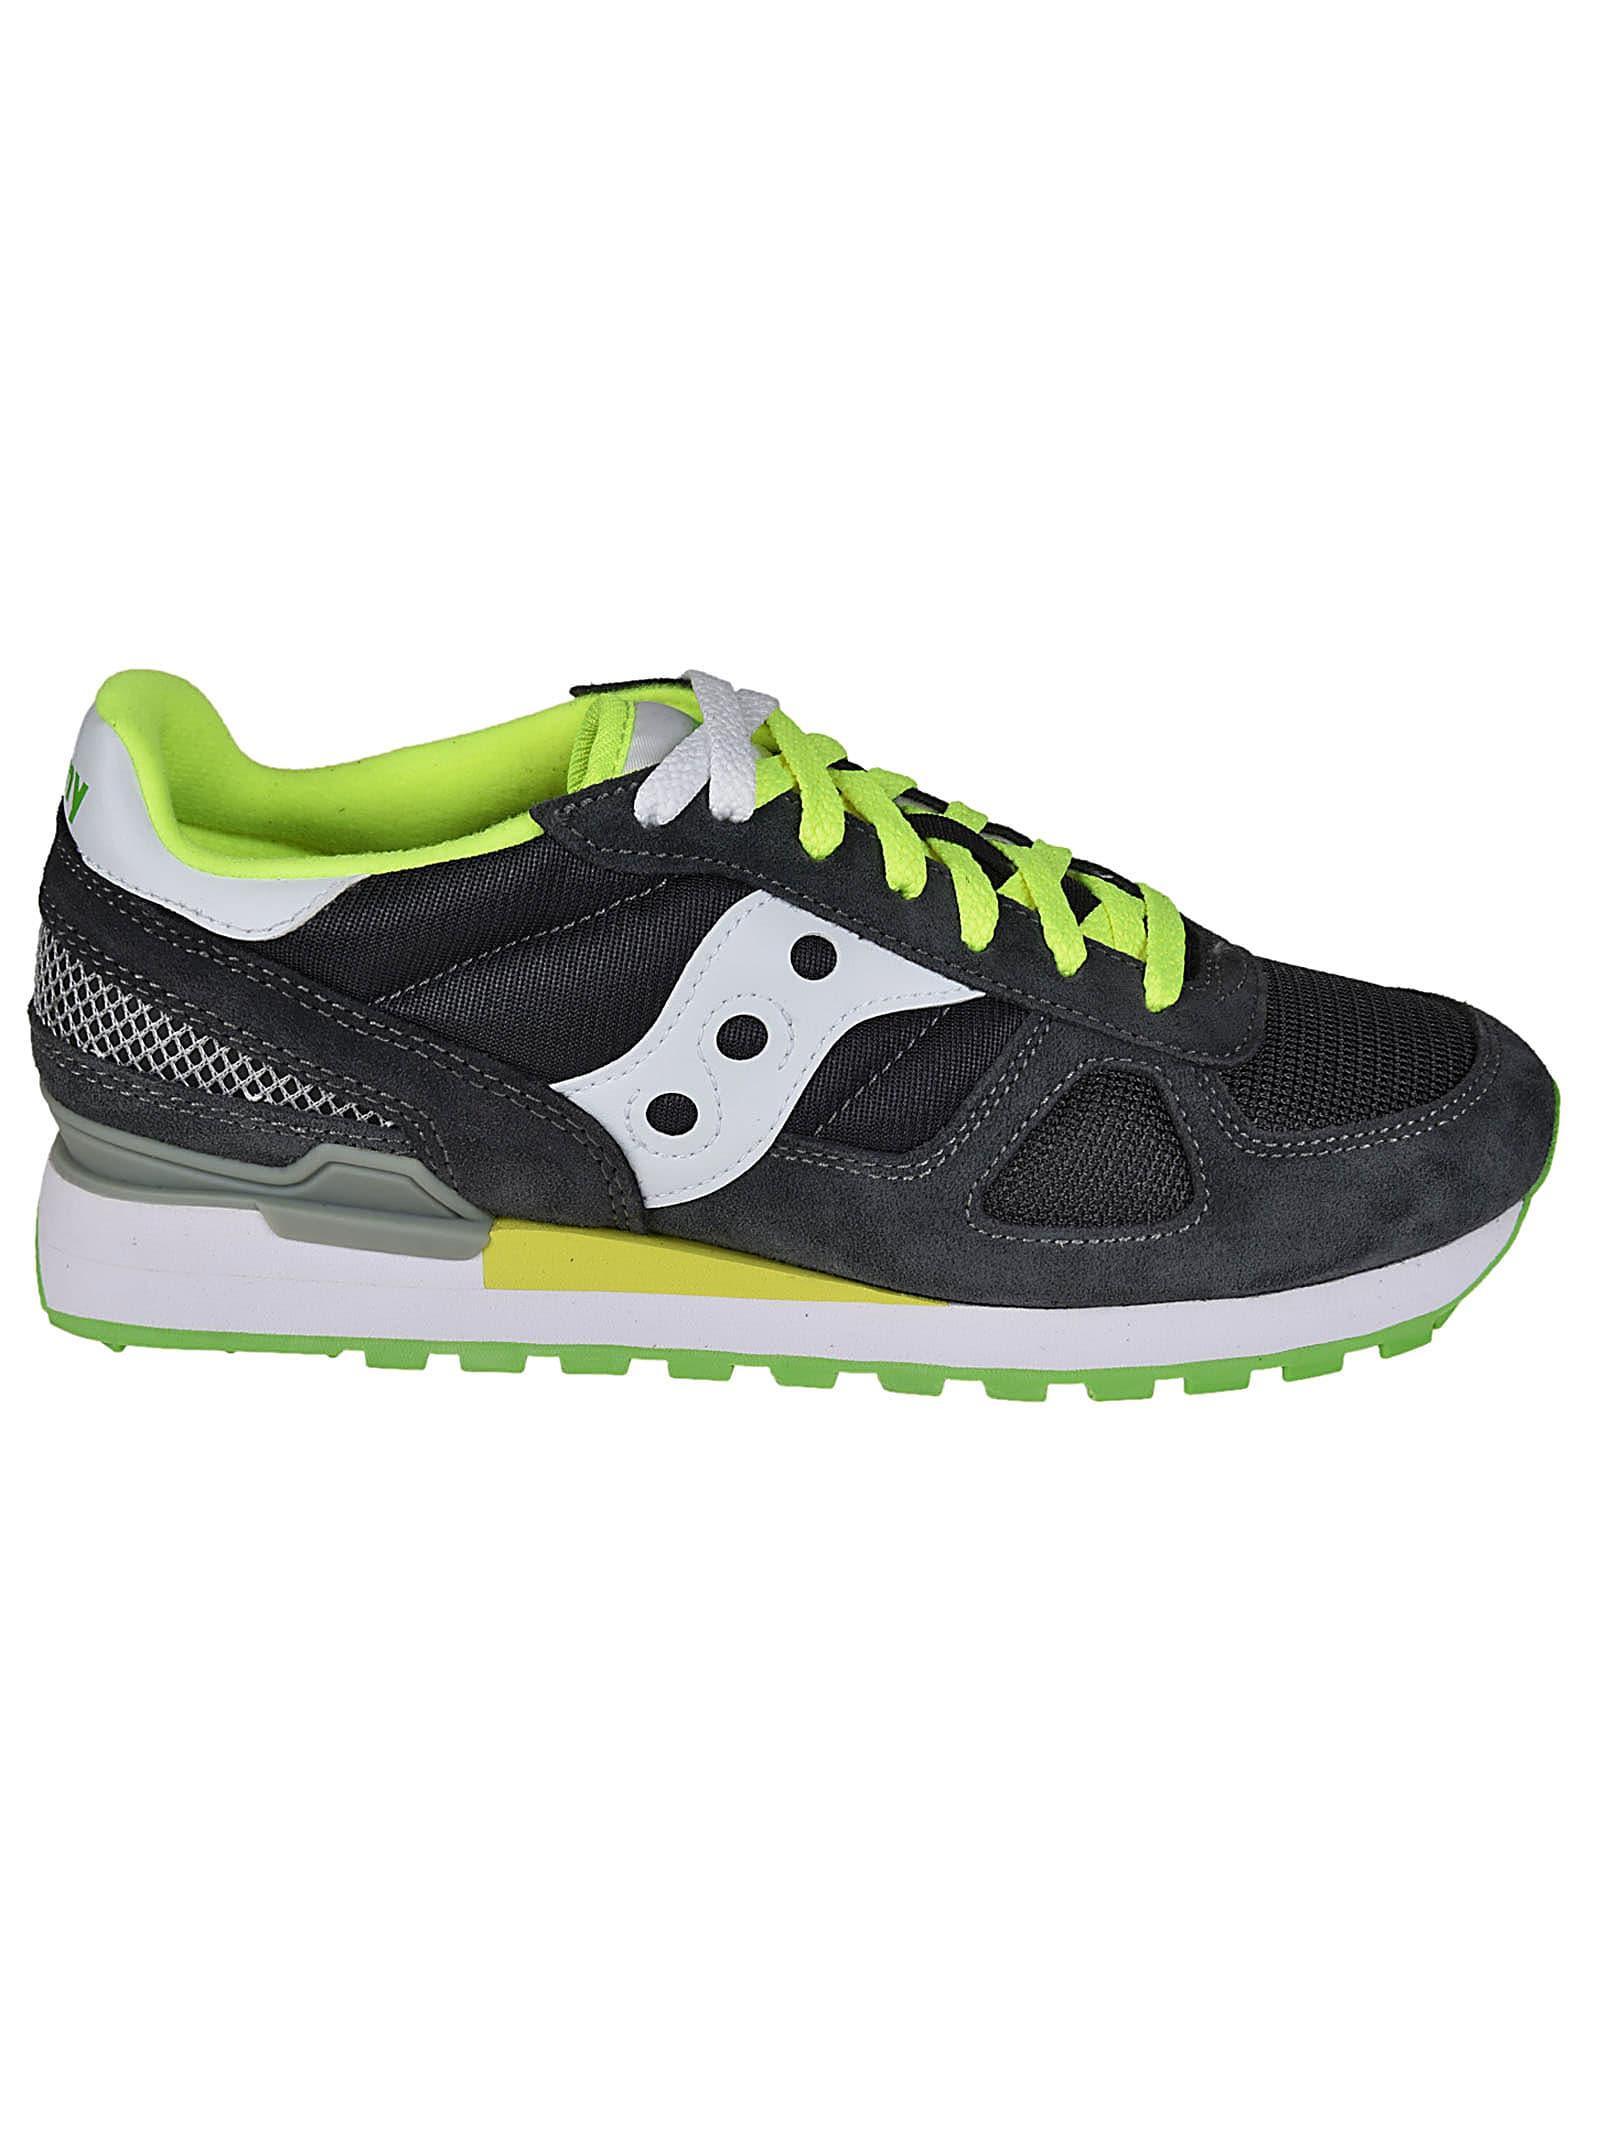 4500f8ca6b321 Saucony Shadow Original Sneakers